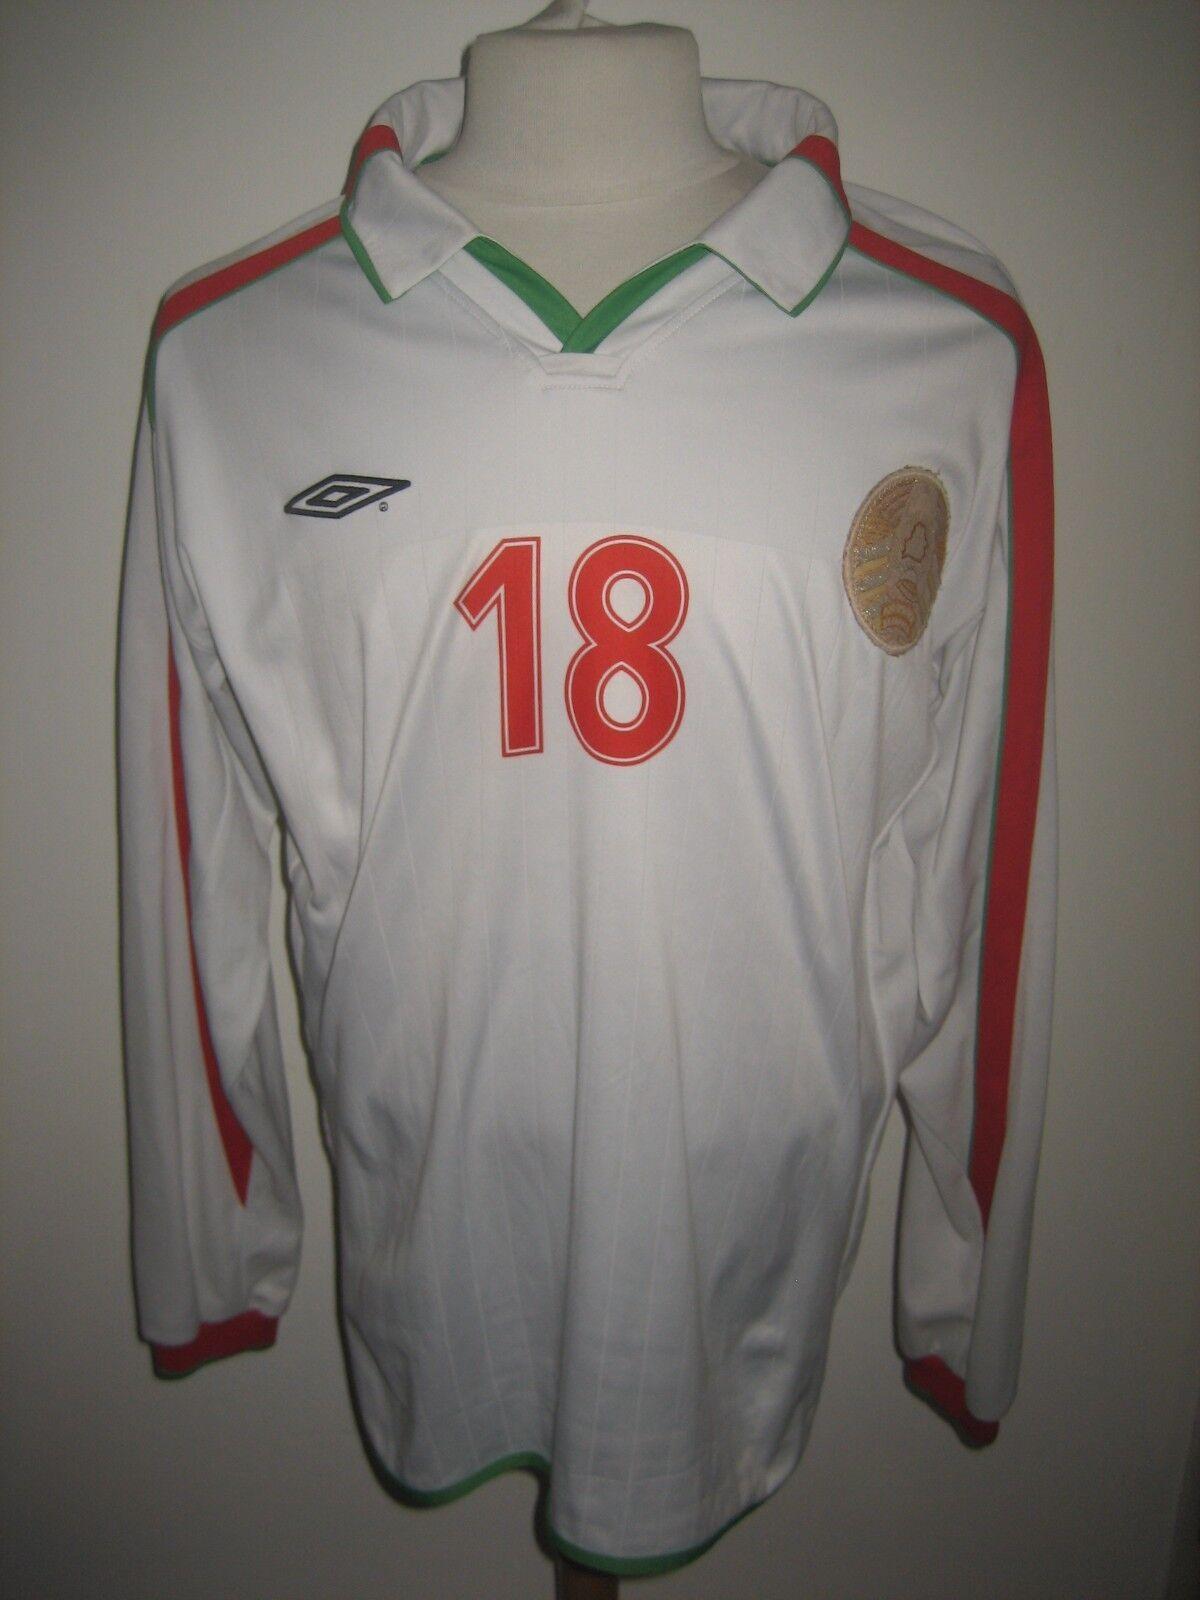 Belarus MATCH WORN home UEFA football shirt soccer jersey trikot maillot Dimensione XL